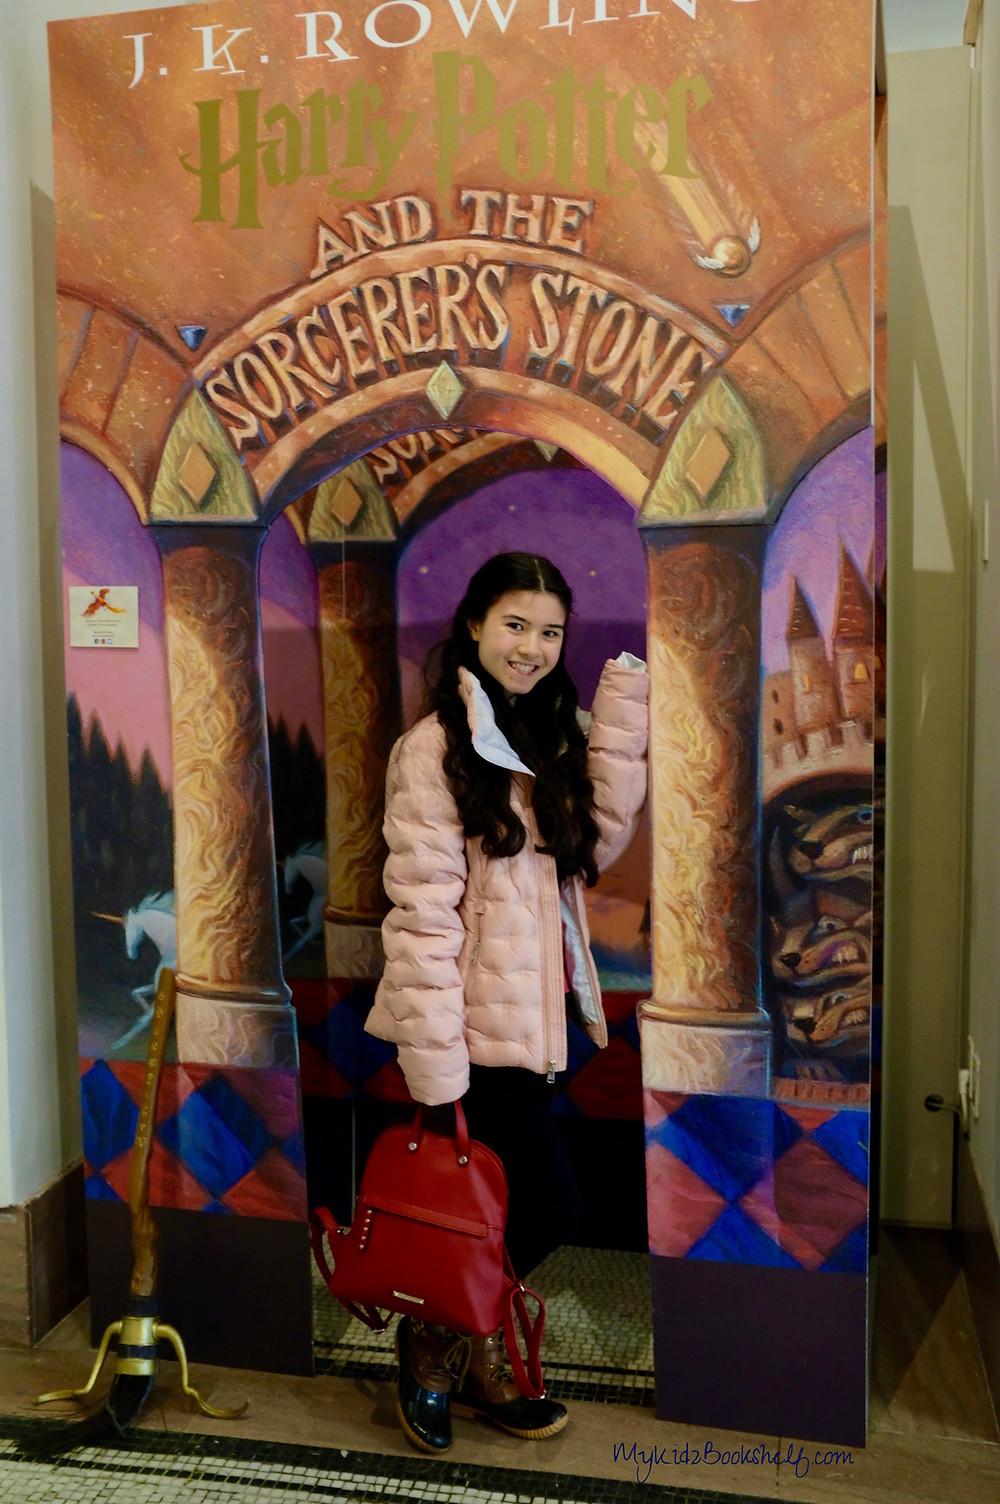 Harry-Potter-History-of-Magic-Exhibit-New-York-Historical-Society